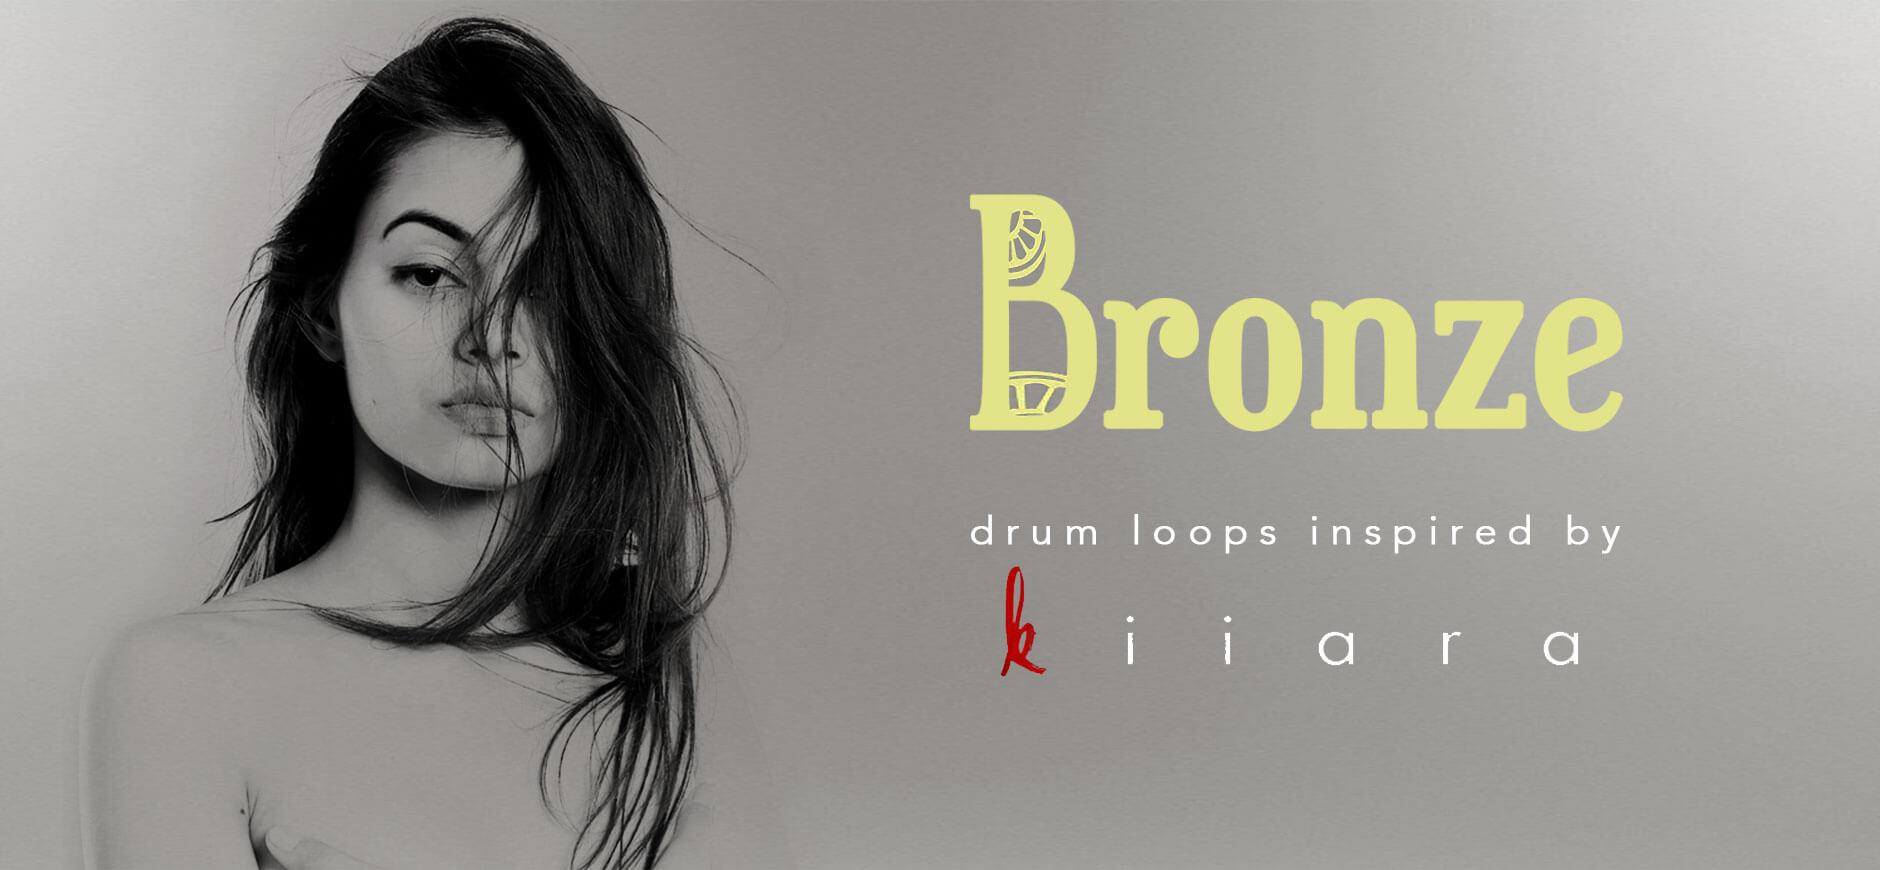 Gold Drum Loops Inspired by Kiiara